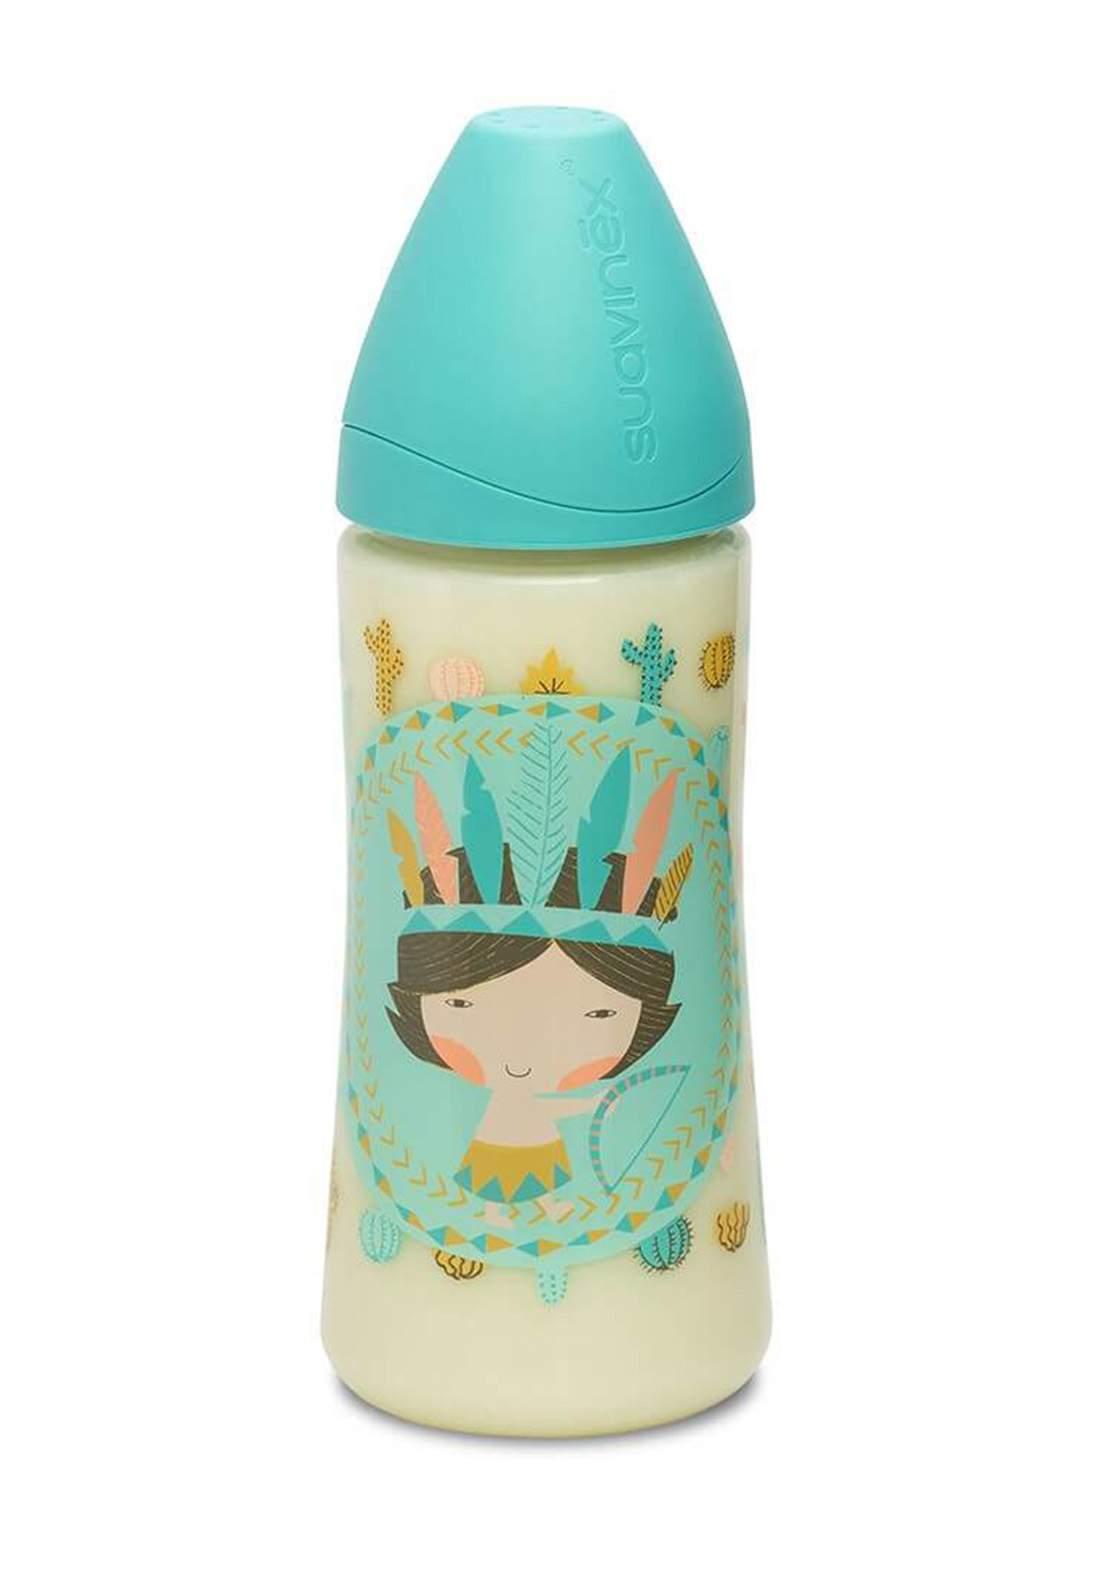 Suavinex Physiological Feeding Bottle 360 ml  رضاعة اطفال